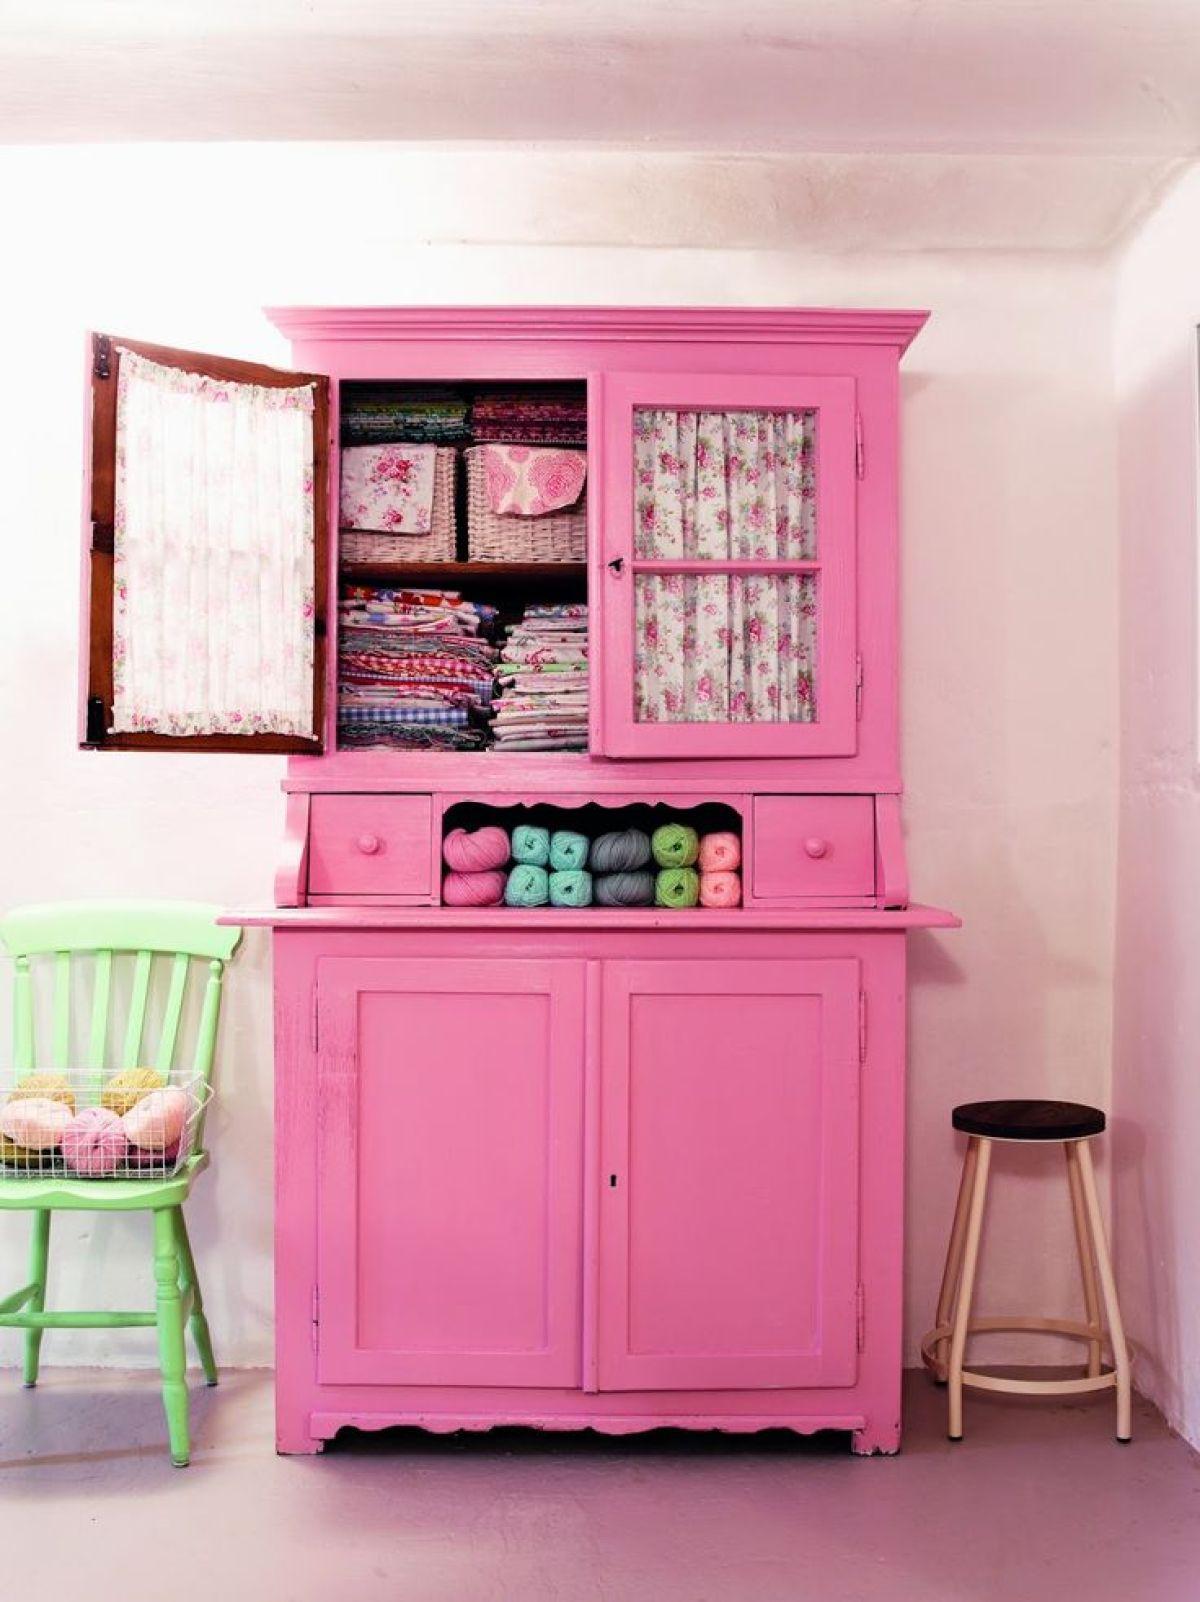 armoire-ancienne-repeinte-rose